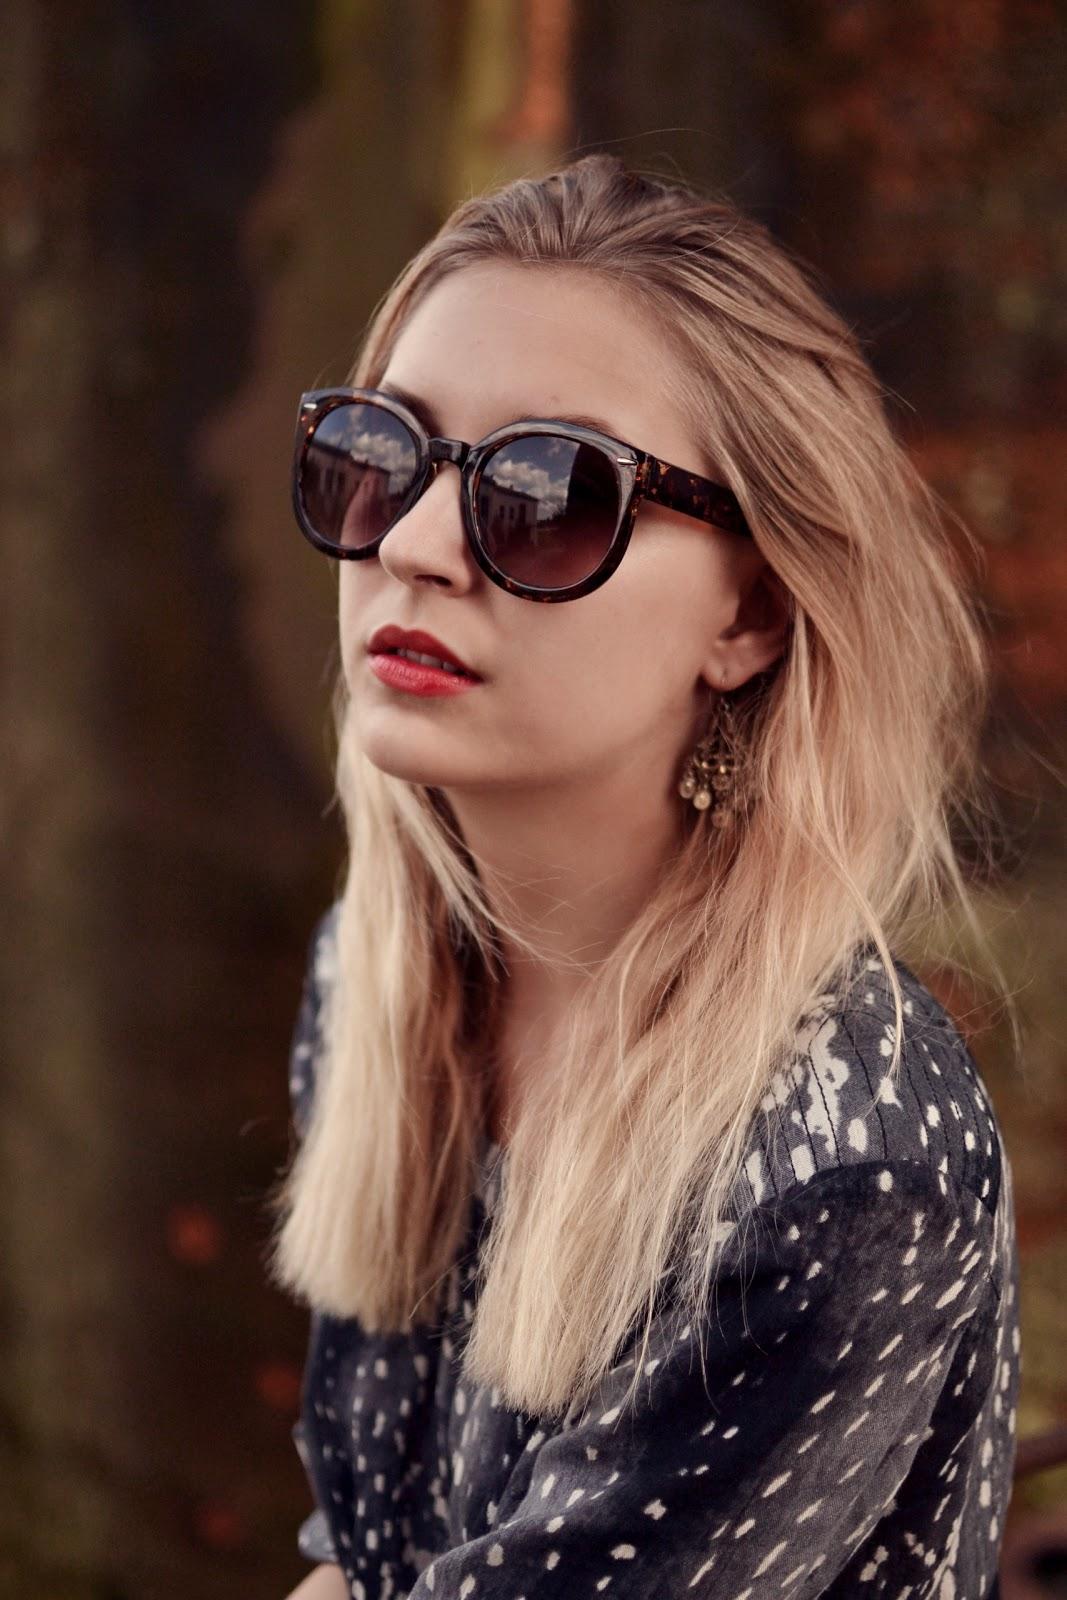 Latvijas modes blogi